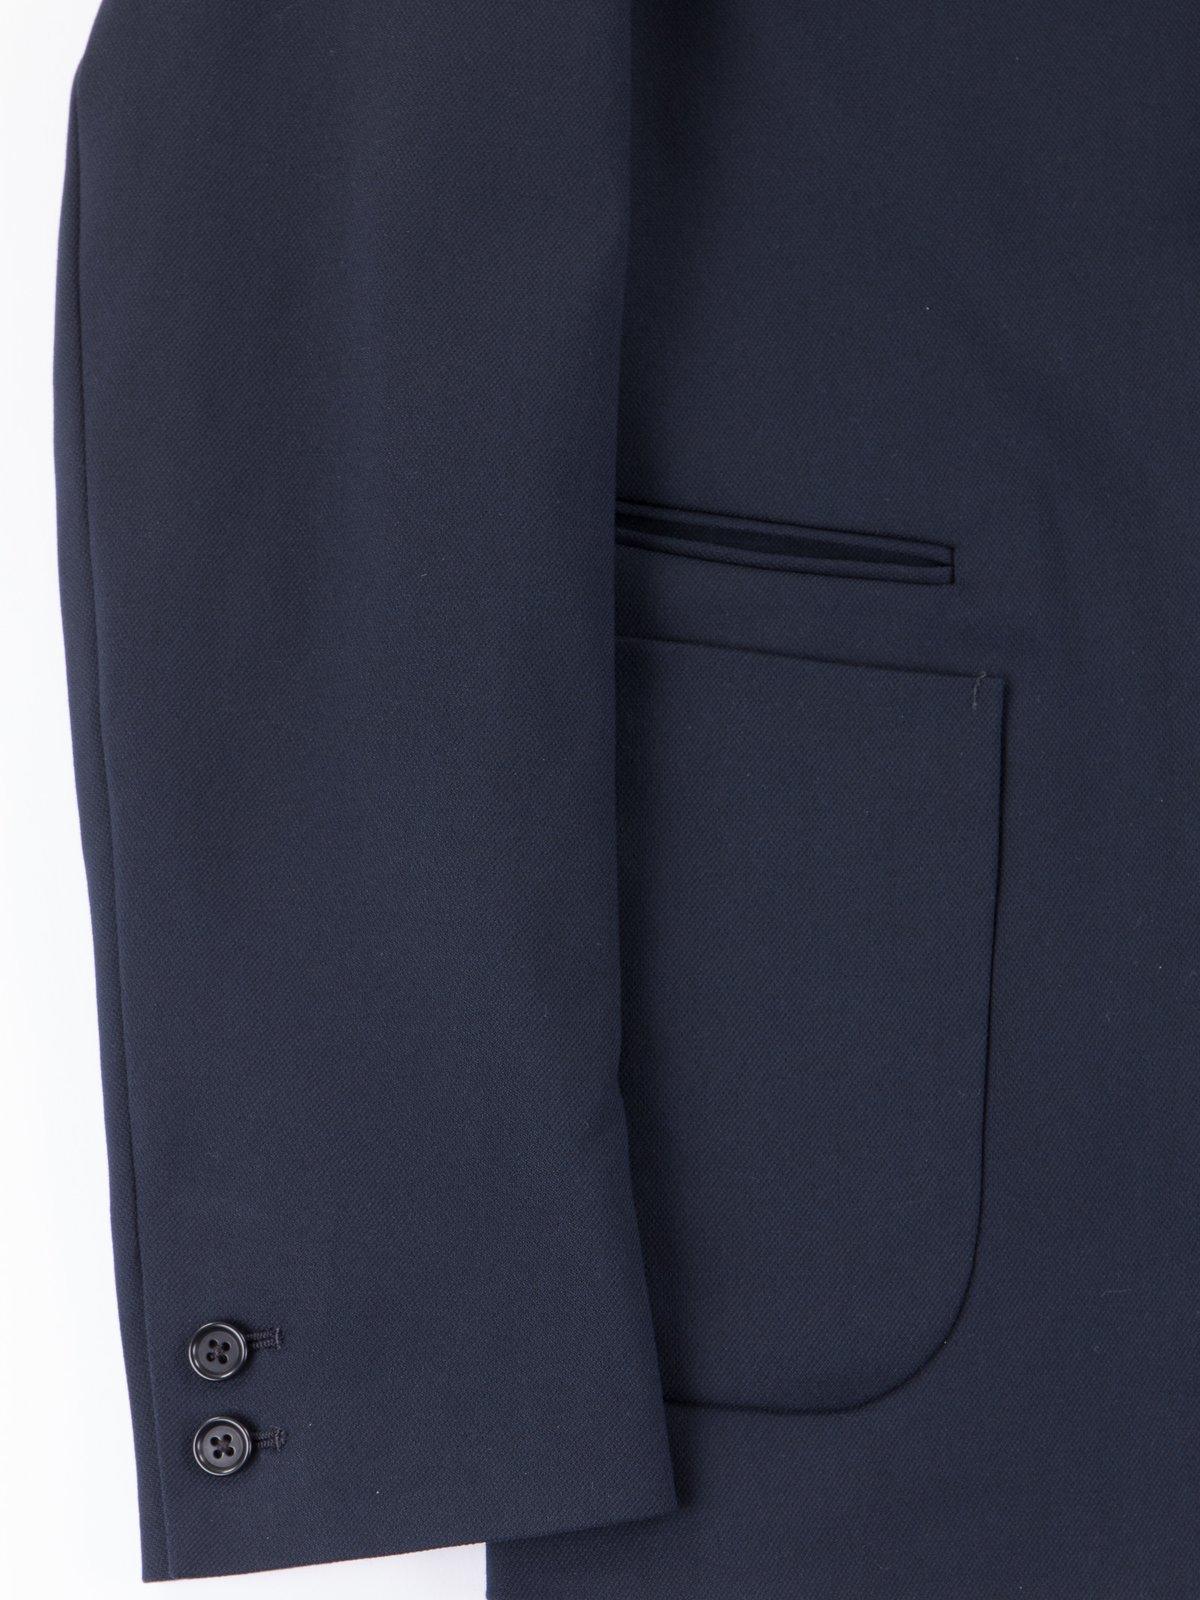 Dark Navy Lounge Jacket - Image 4